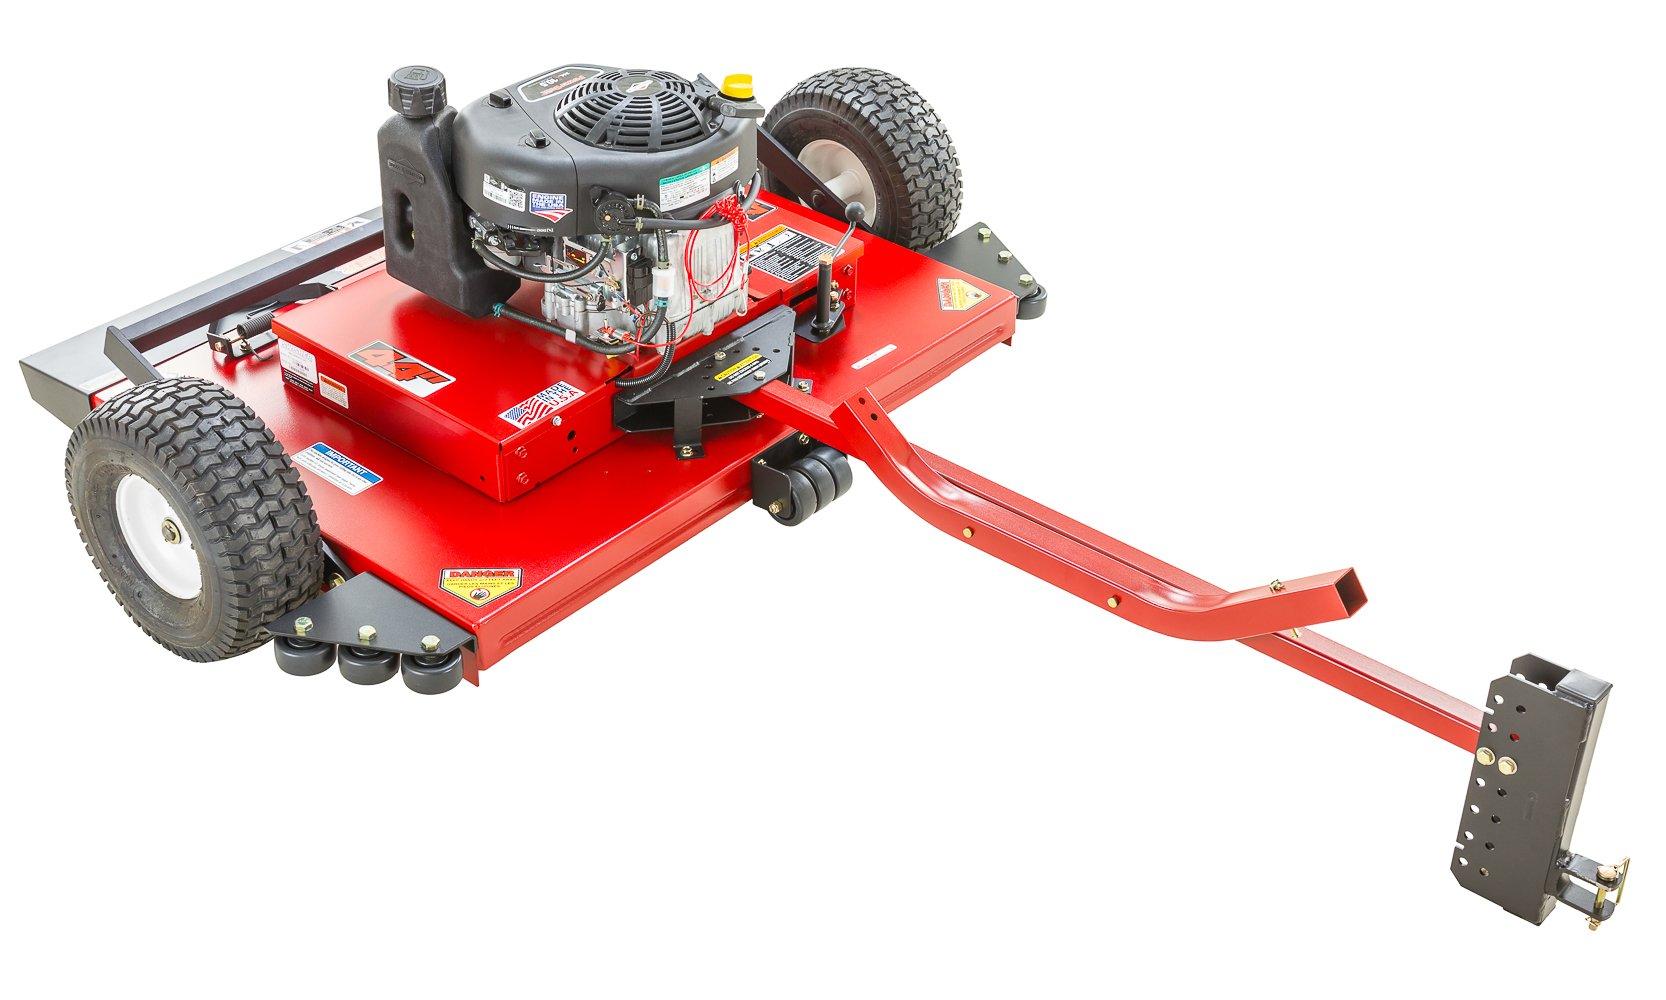 Swisher FC10544CL Classic 44'' 10.5 HP Finish Cut Trail Mower by Swisher